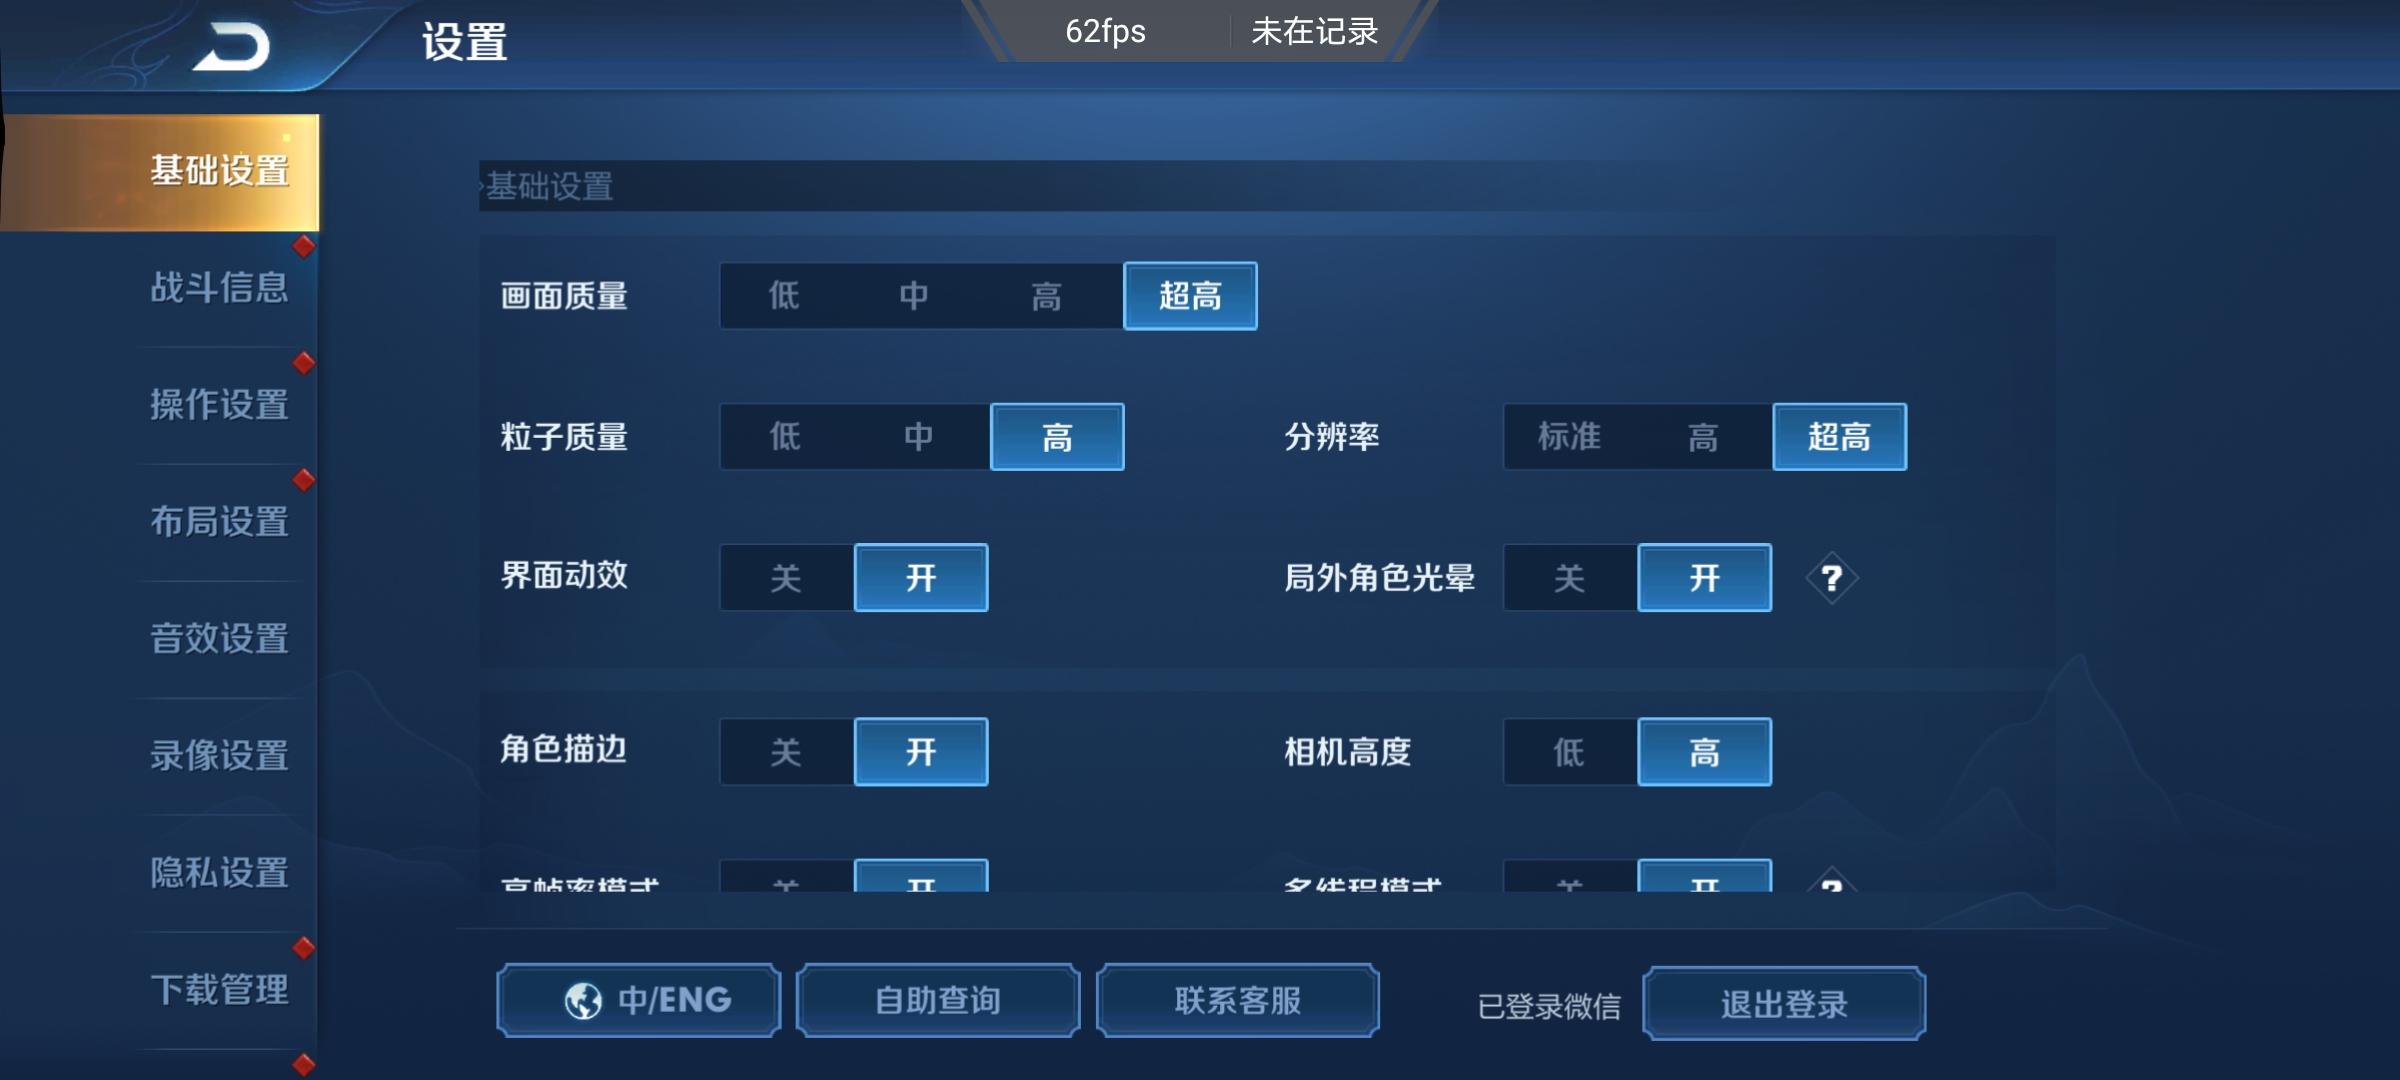 Screenshot_20200517_022827_com.tencent.tmgp.sgame.jpg